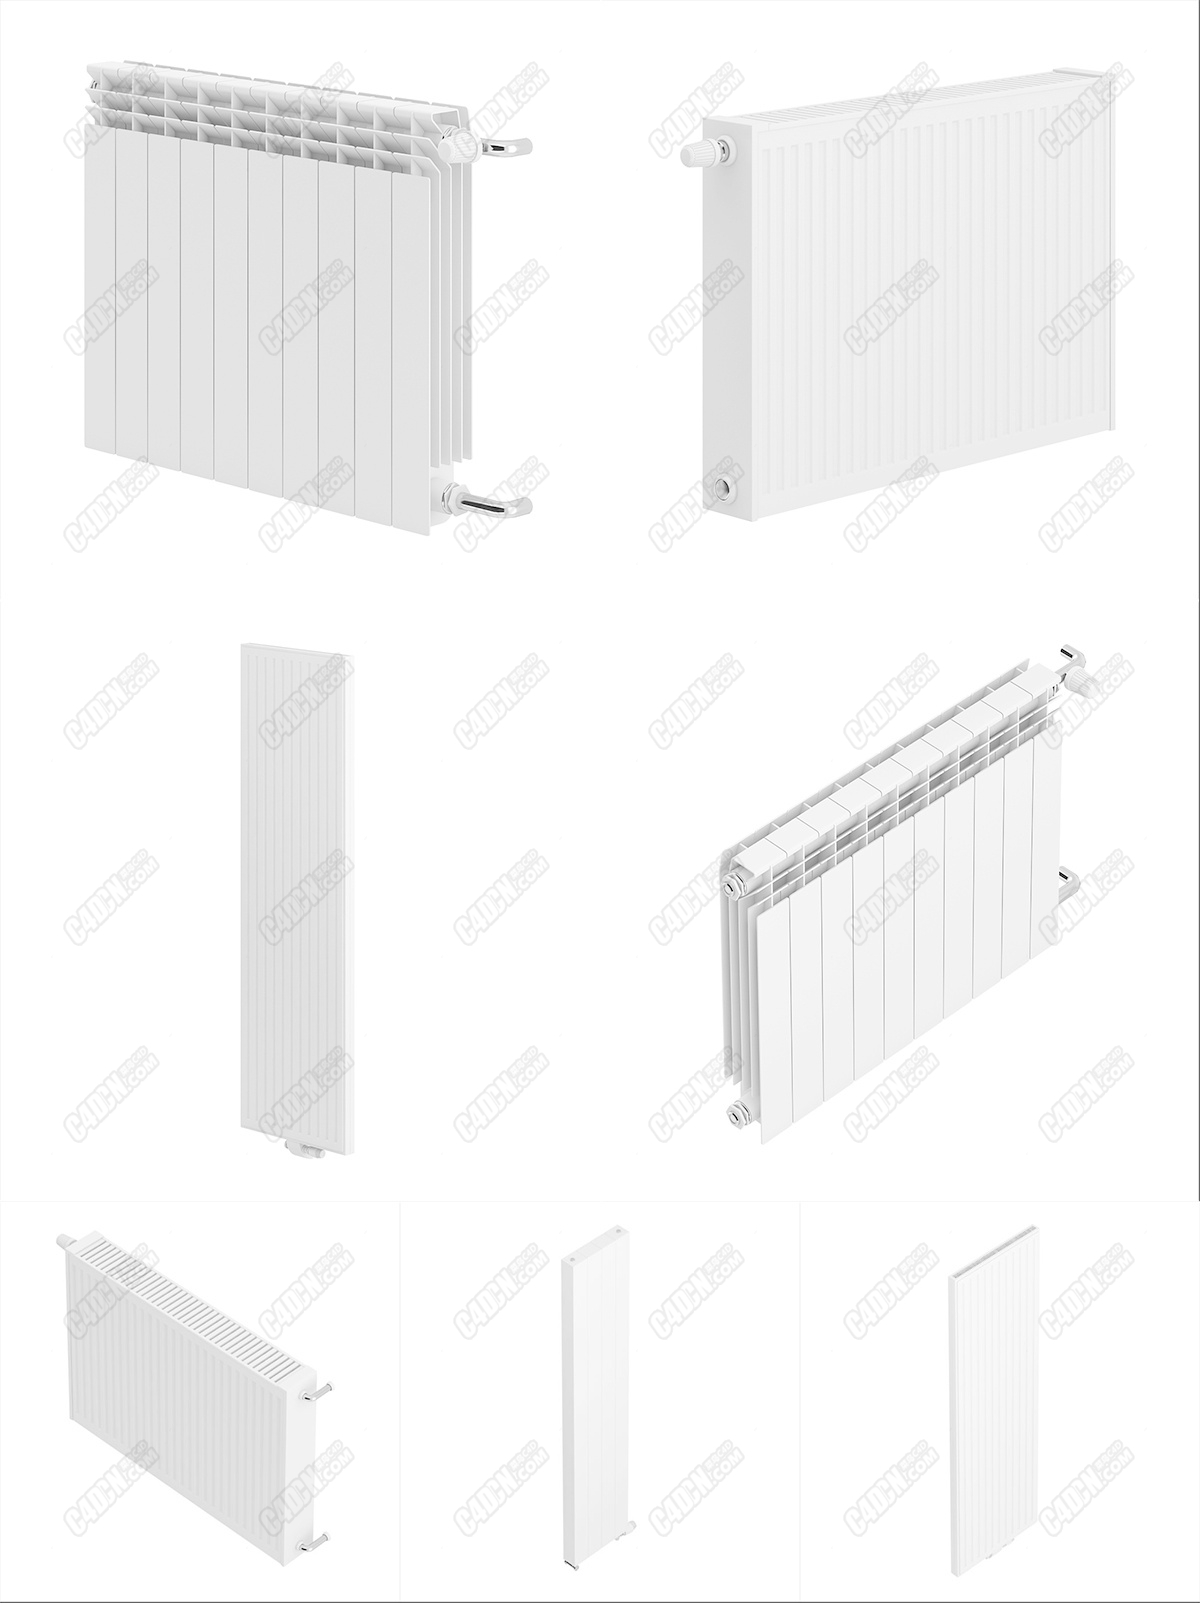 C4D四套浴室臥室暖氣片取暖設備模型